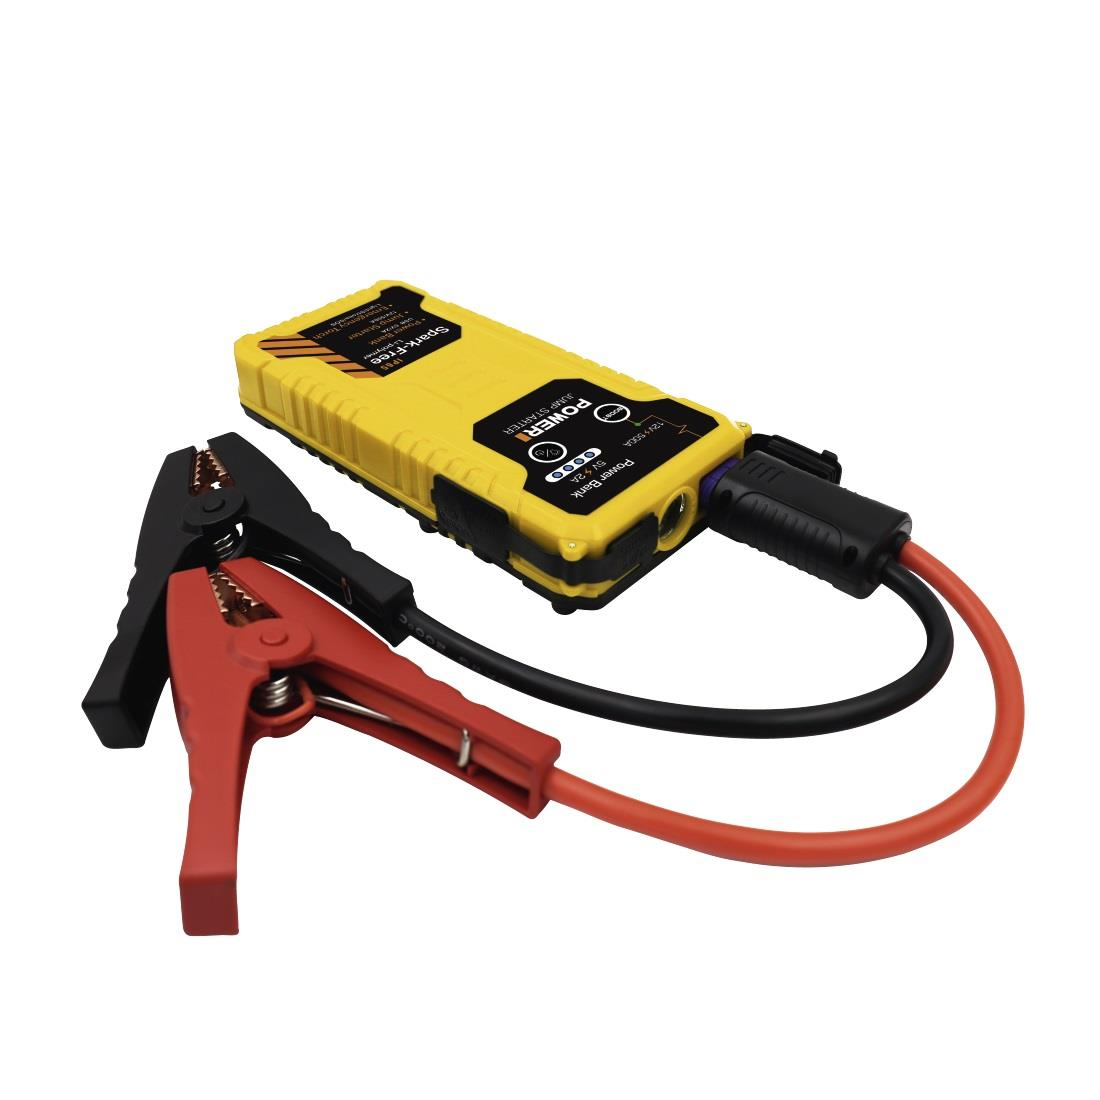 HAMA 3in1 Vehicle Starting Helper 27.9Wh